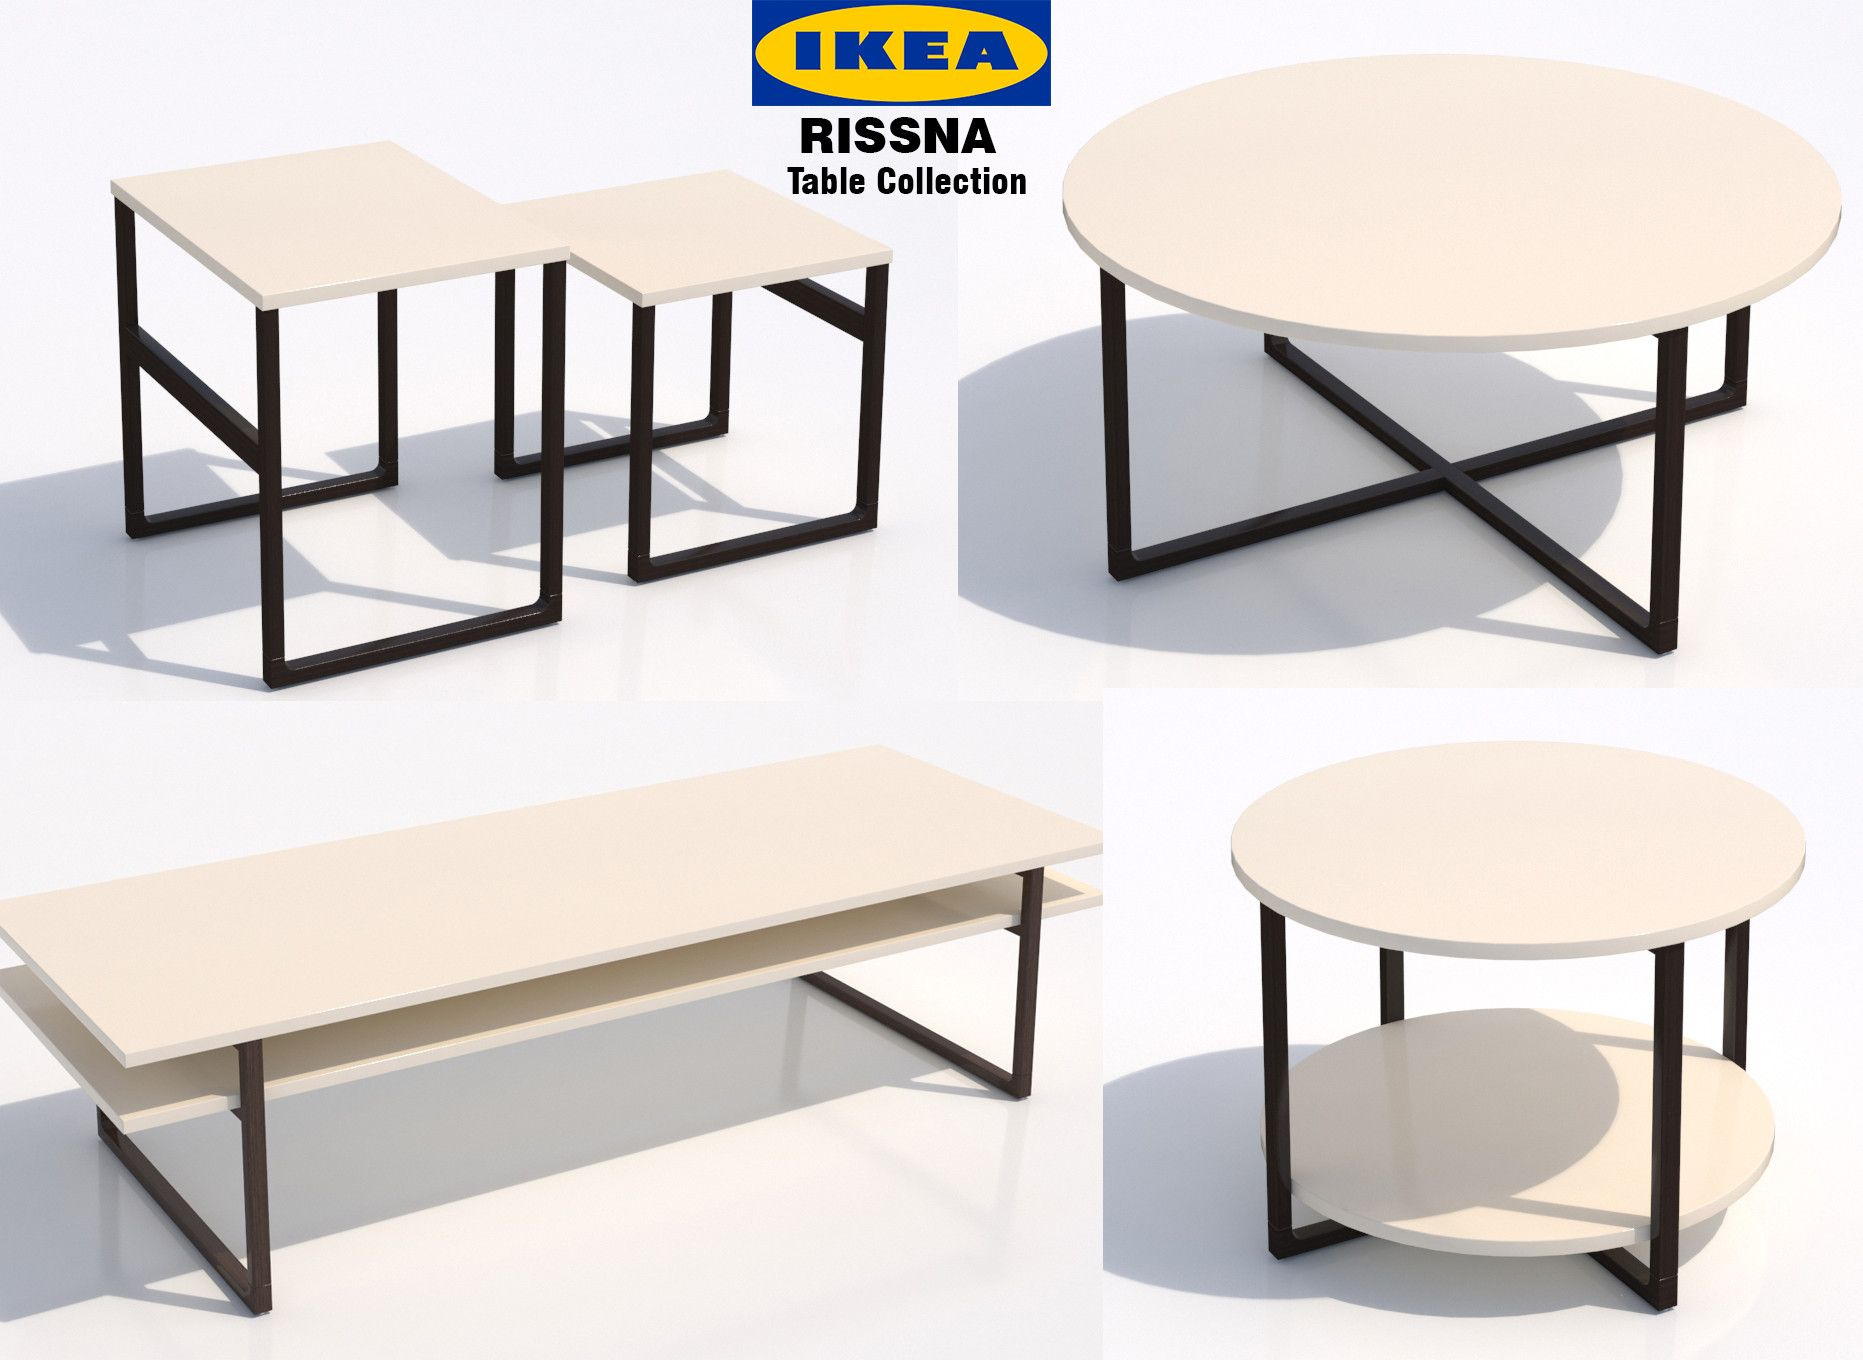 Ikea Rissna Table 3d Max 3d Model Table Ikea Coffee Table [ 1360 x 1863 Pixel ]